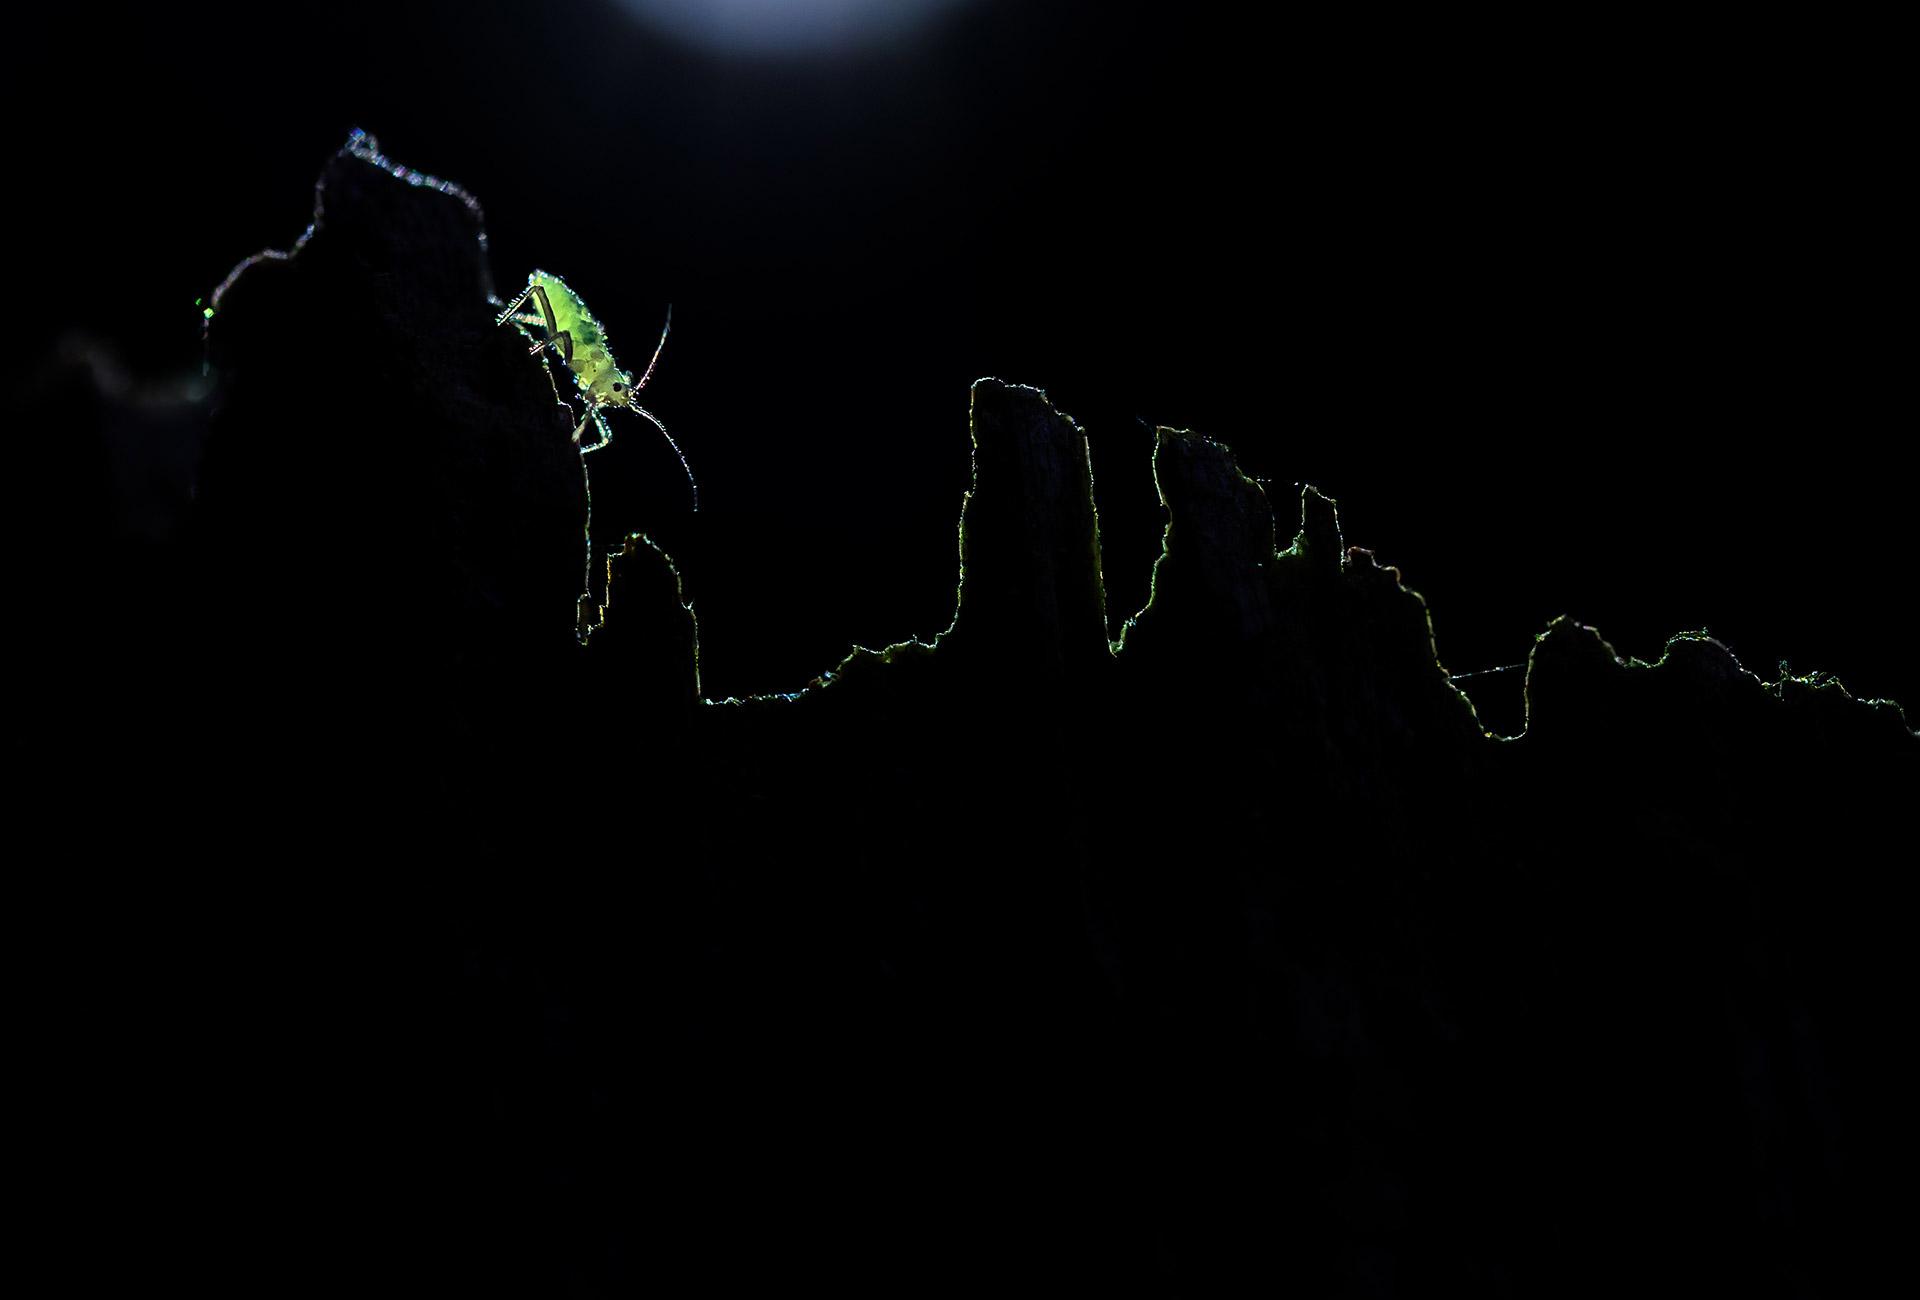 Скалолазка, © Валерия Зверева, 1-е место в номинации «Макросъёмка», Фотоконкурс «Дикая природа России» от National Geographic